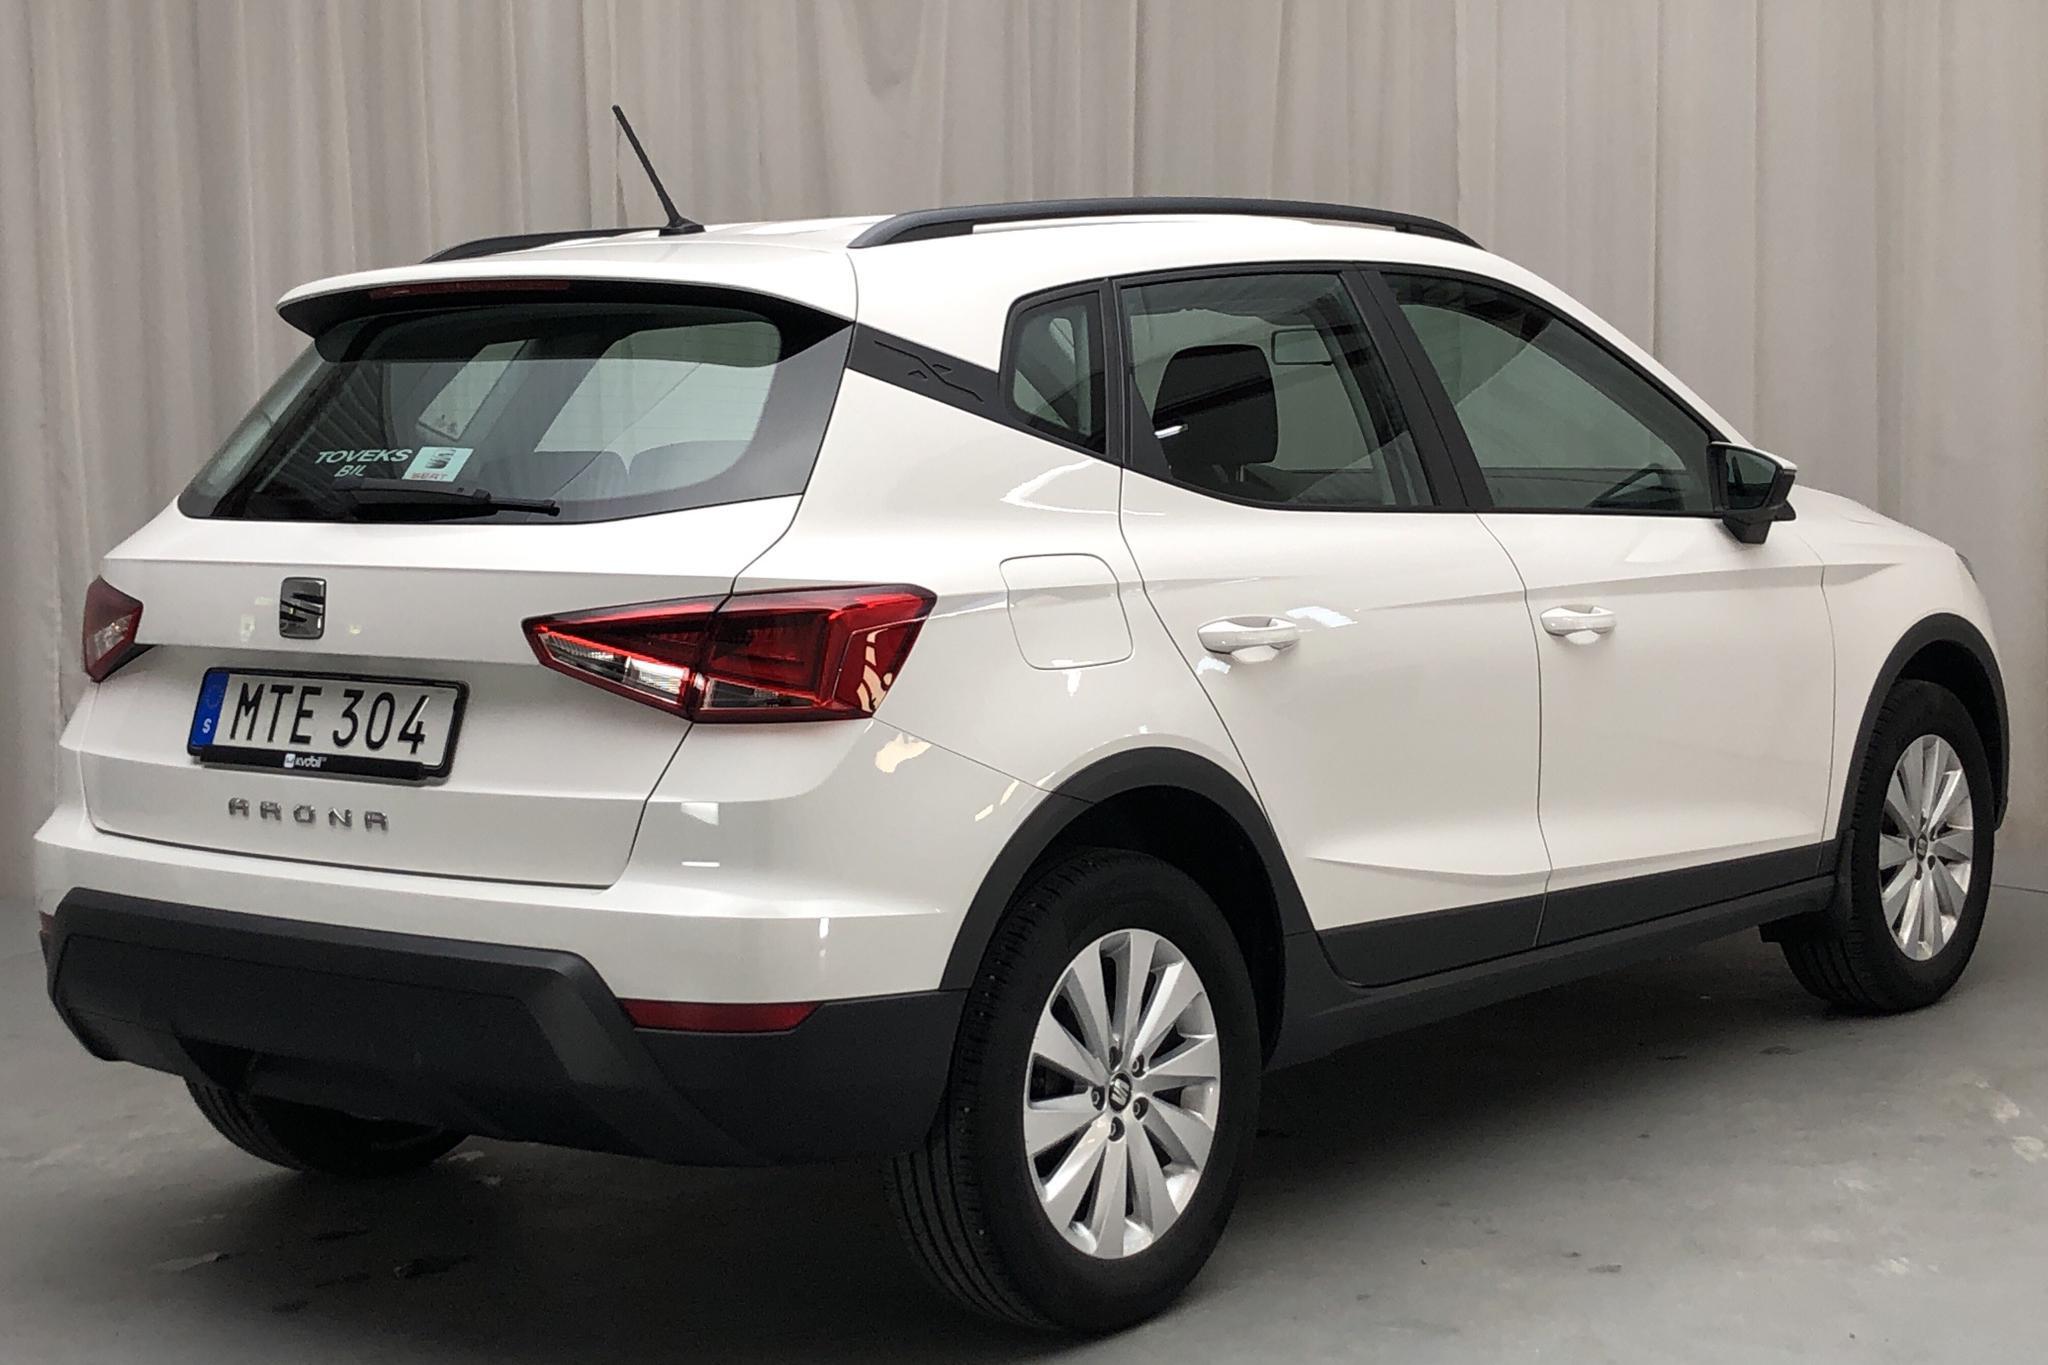 Seat Arona 1.0 TSI 5dr (95hk) - 28 020 km - Manual - white - 2018